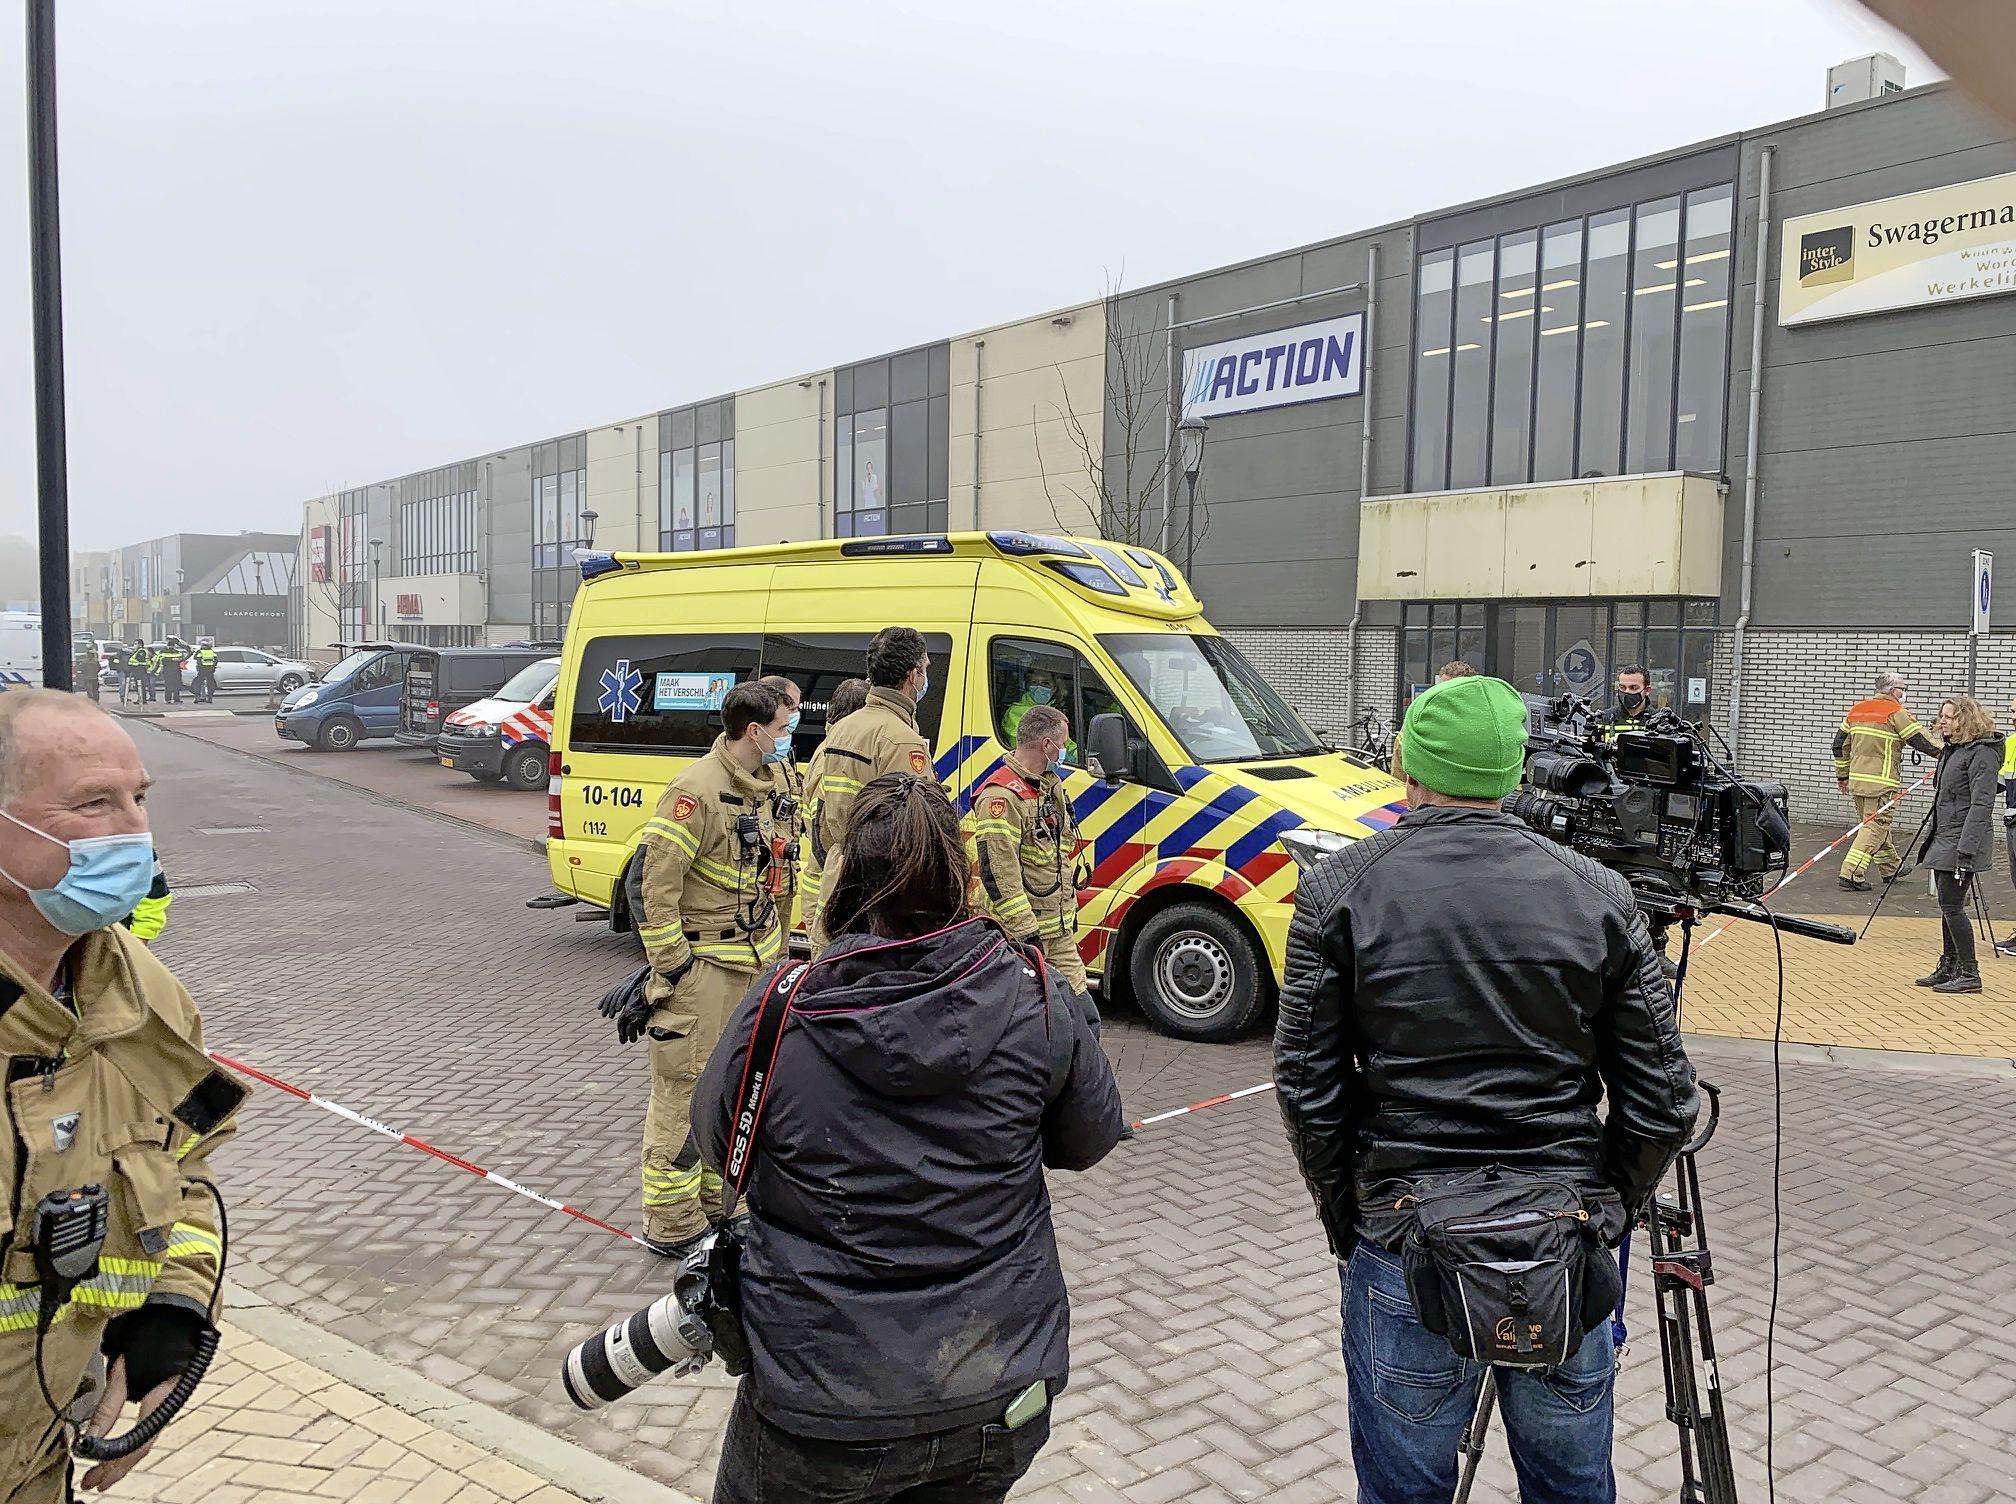 Explosie bij teststraat in Bovenkarspel is zelfs in Engeland nieuws: 'A Covid-19-testcentre has been hit by an explosion in a Dutch town' [column]